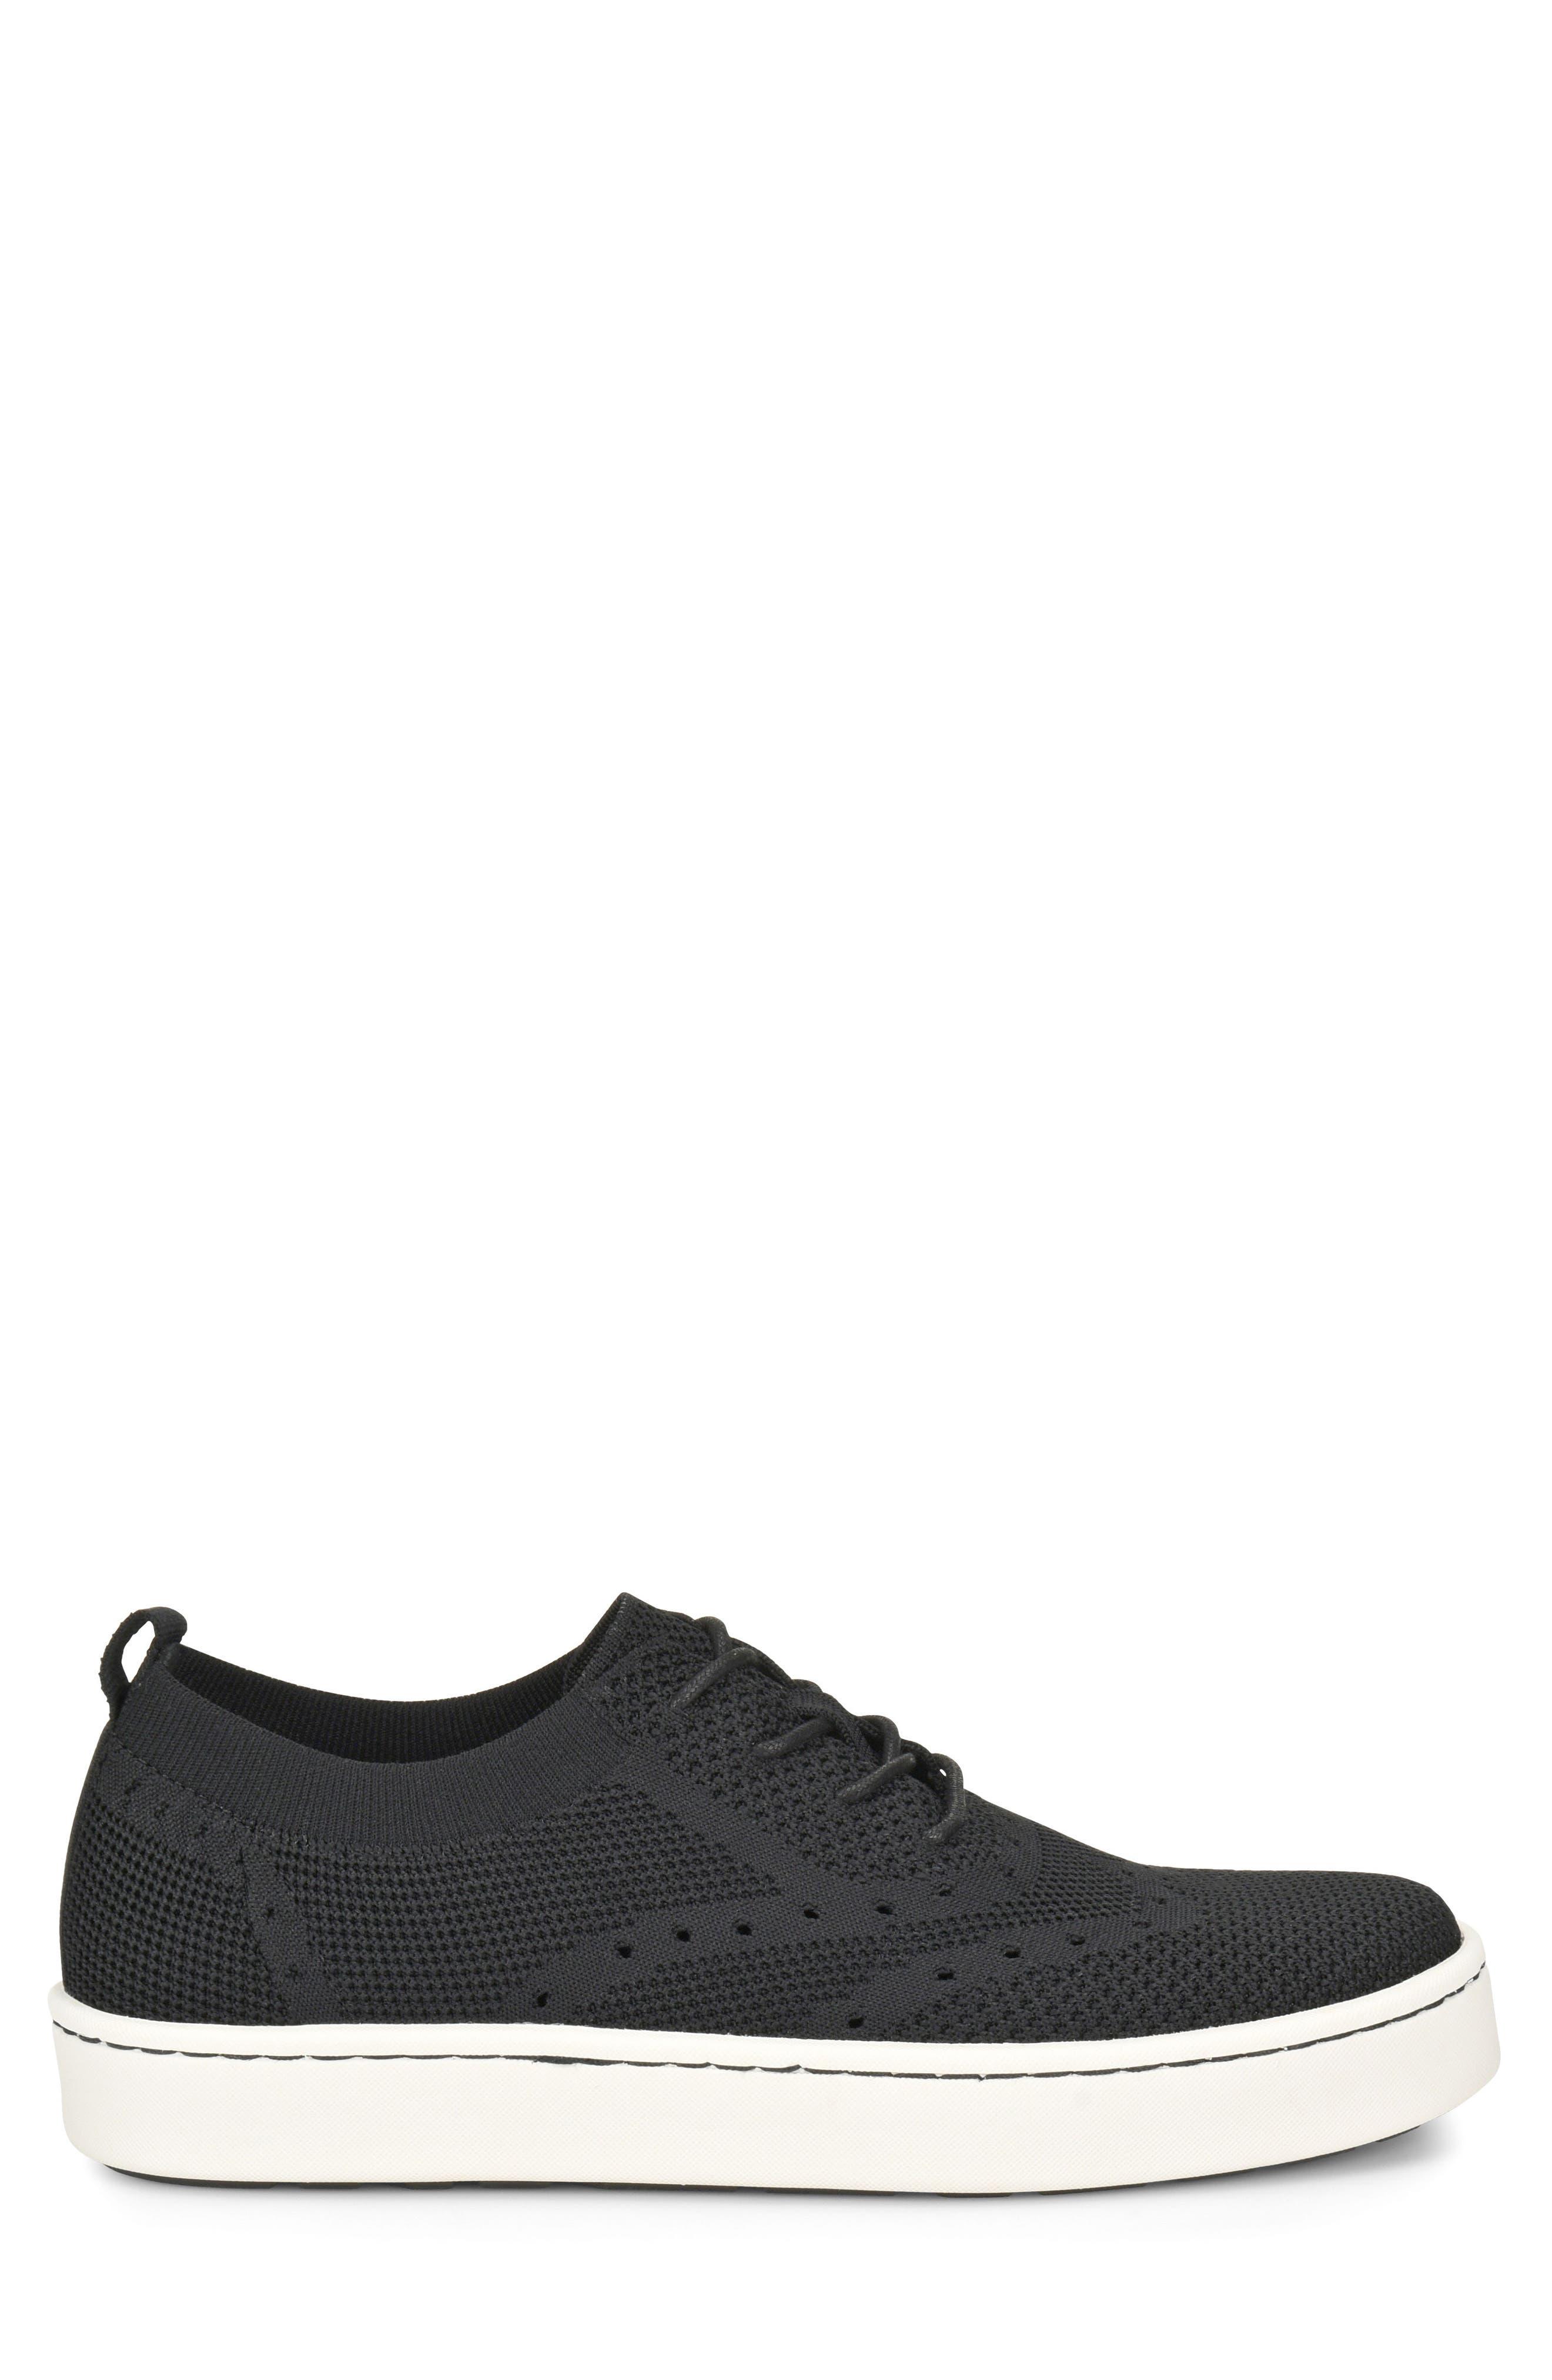 Bearse Sneaker,                             Alternate thumbnail 3, color,                             Black Knit